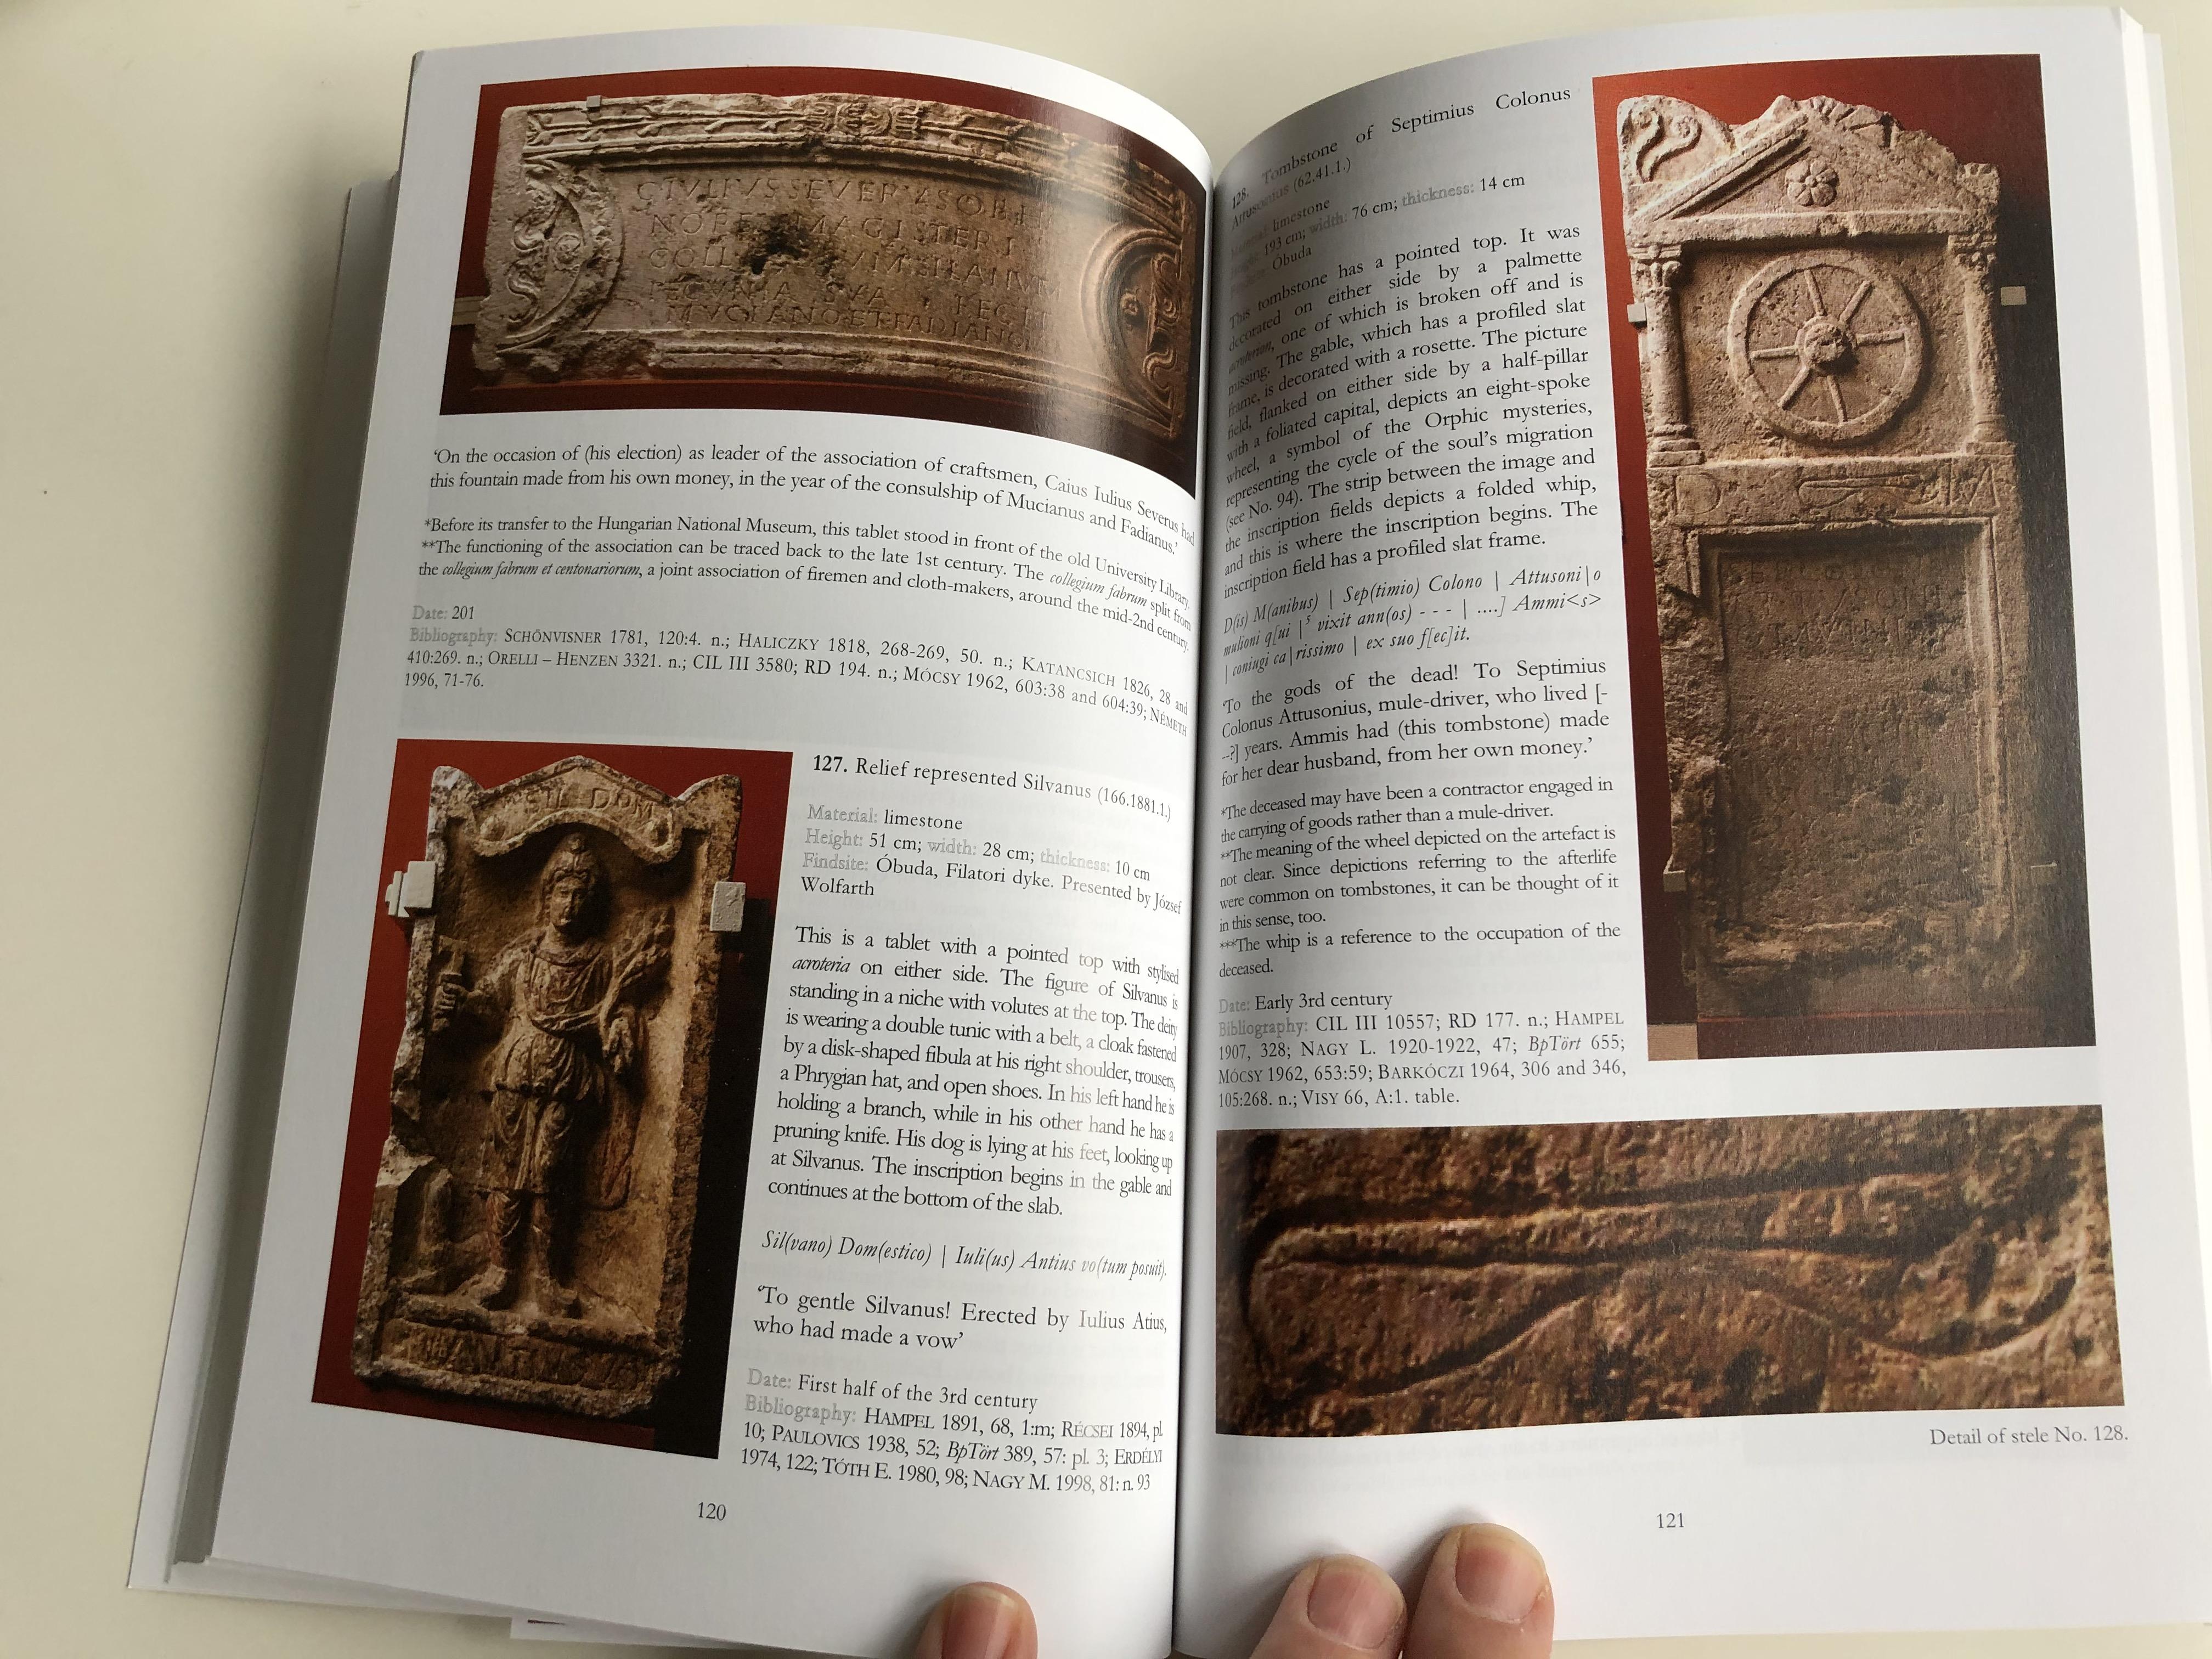 roman-stones-by-mih-ly-nagy-lapidarium-13.jpg